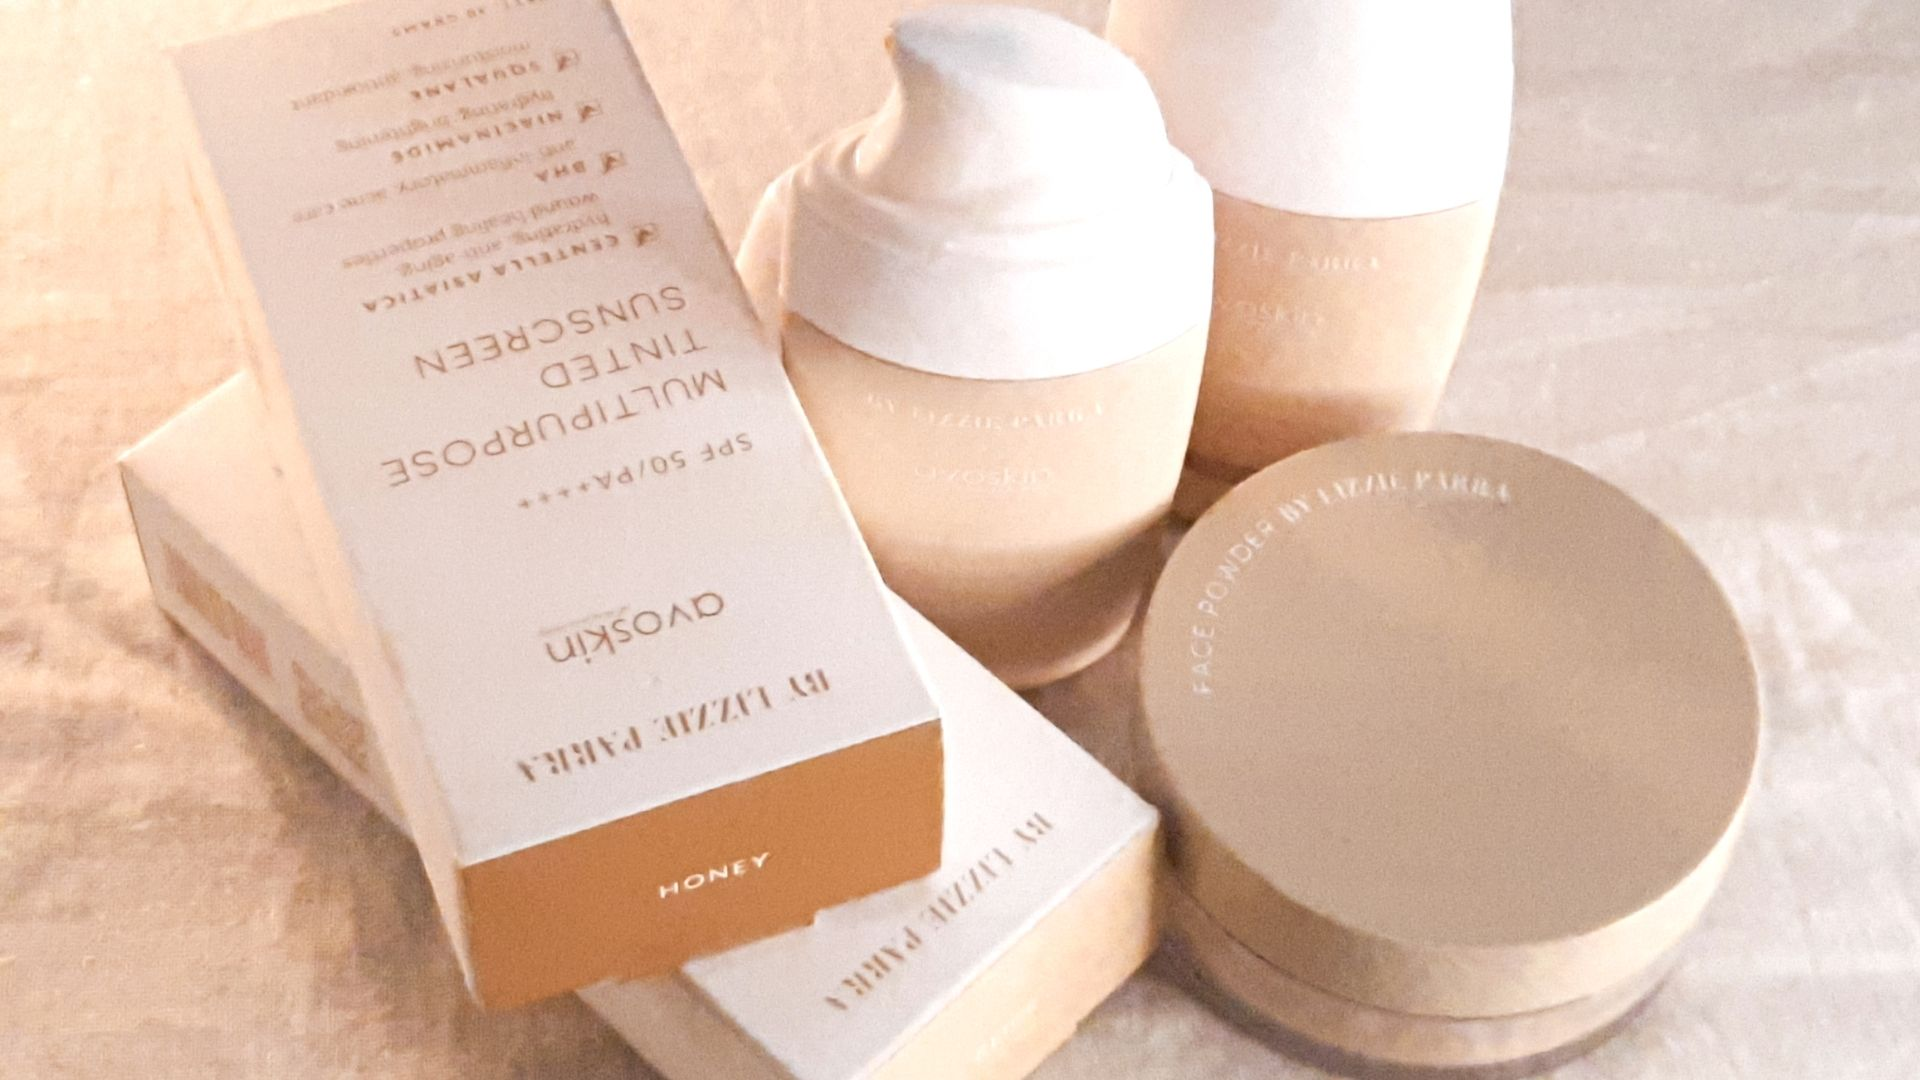 BLP x Avoskin tinted sunscreen and face powder